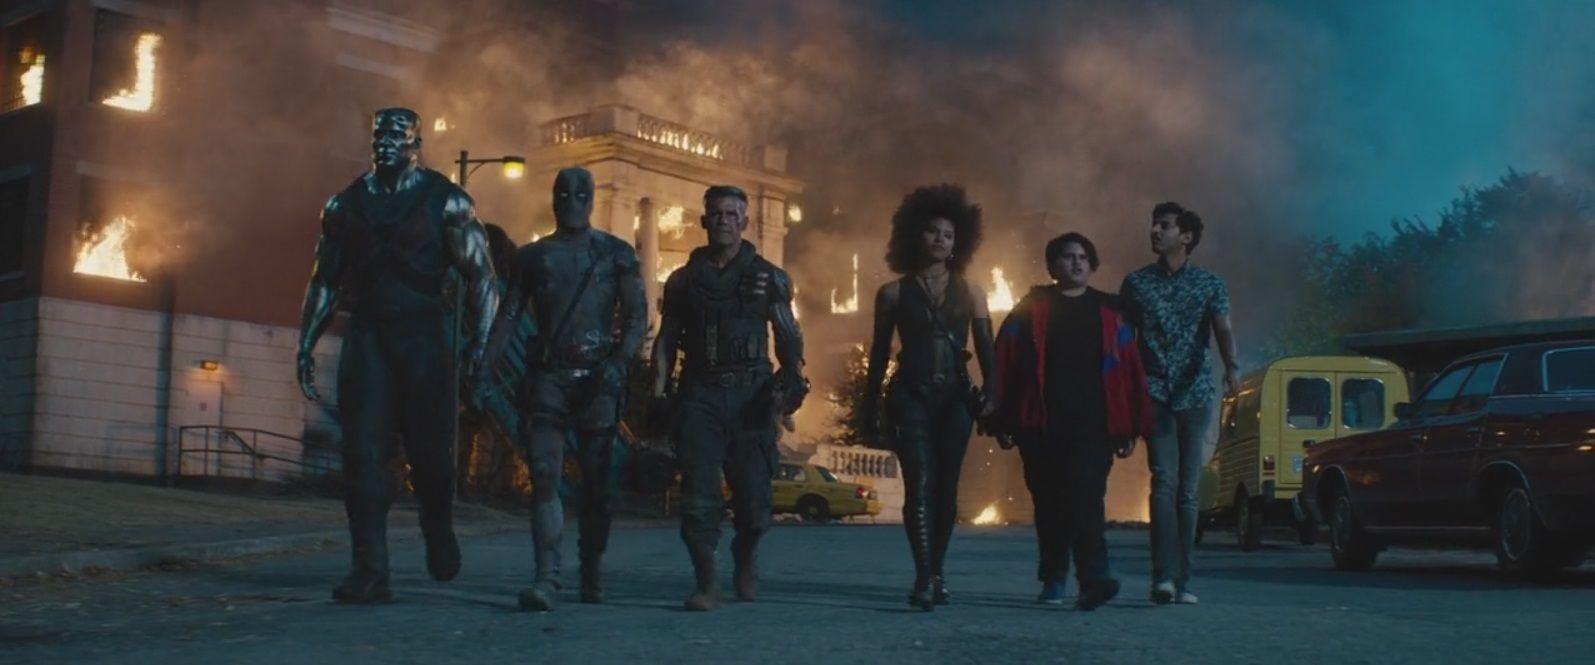 Deadpool 2 2018 Filmes